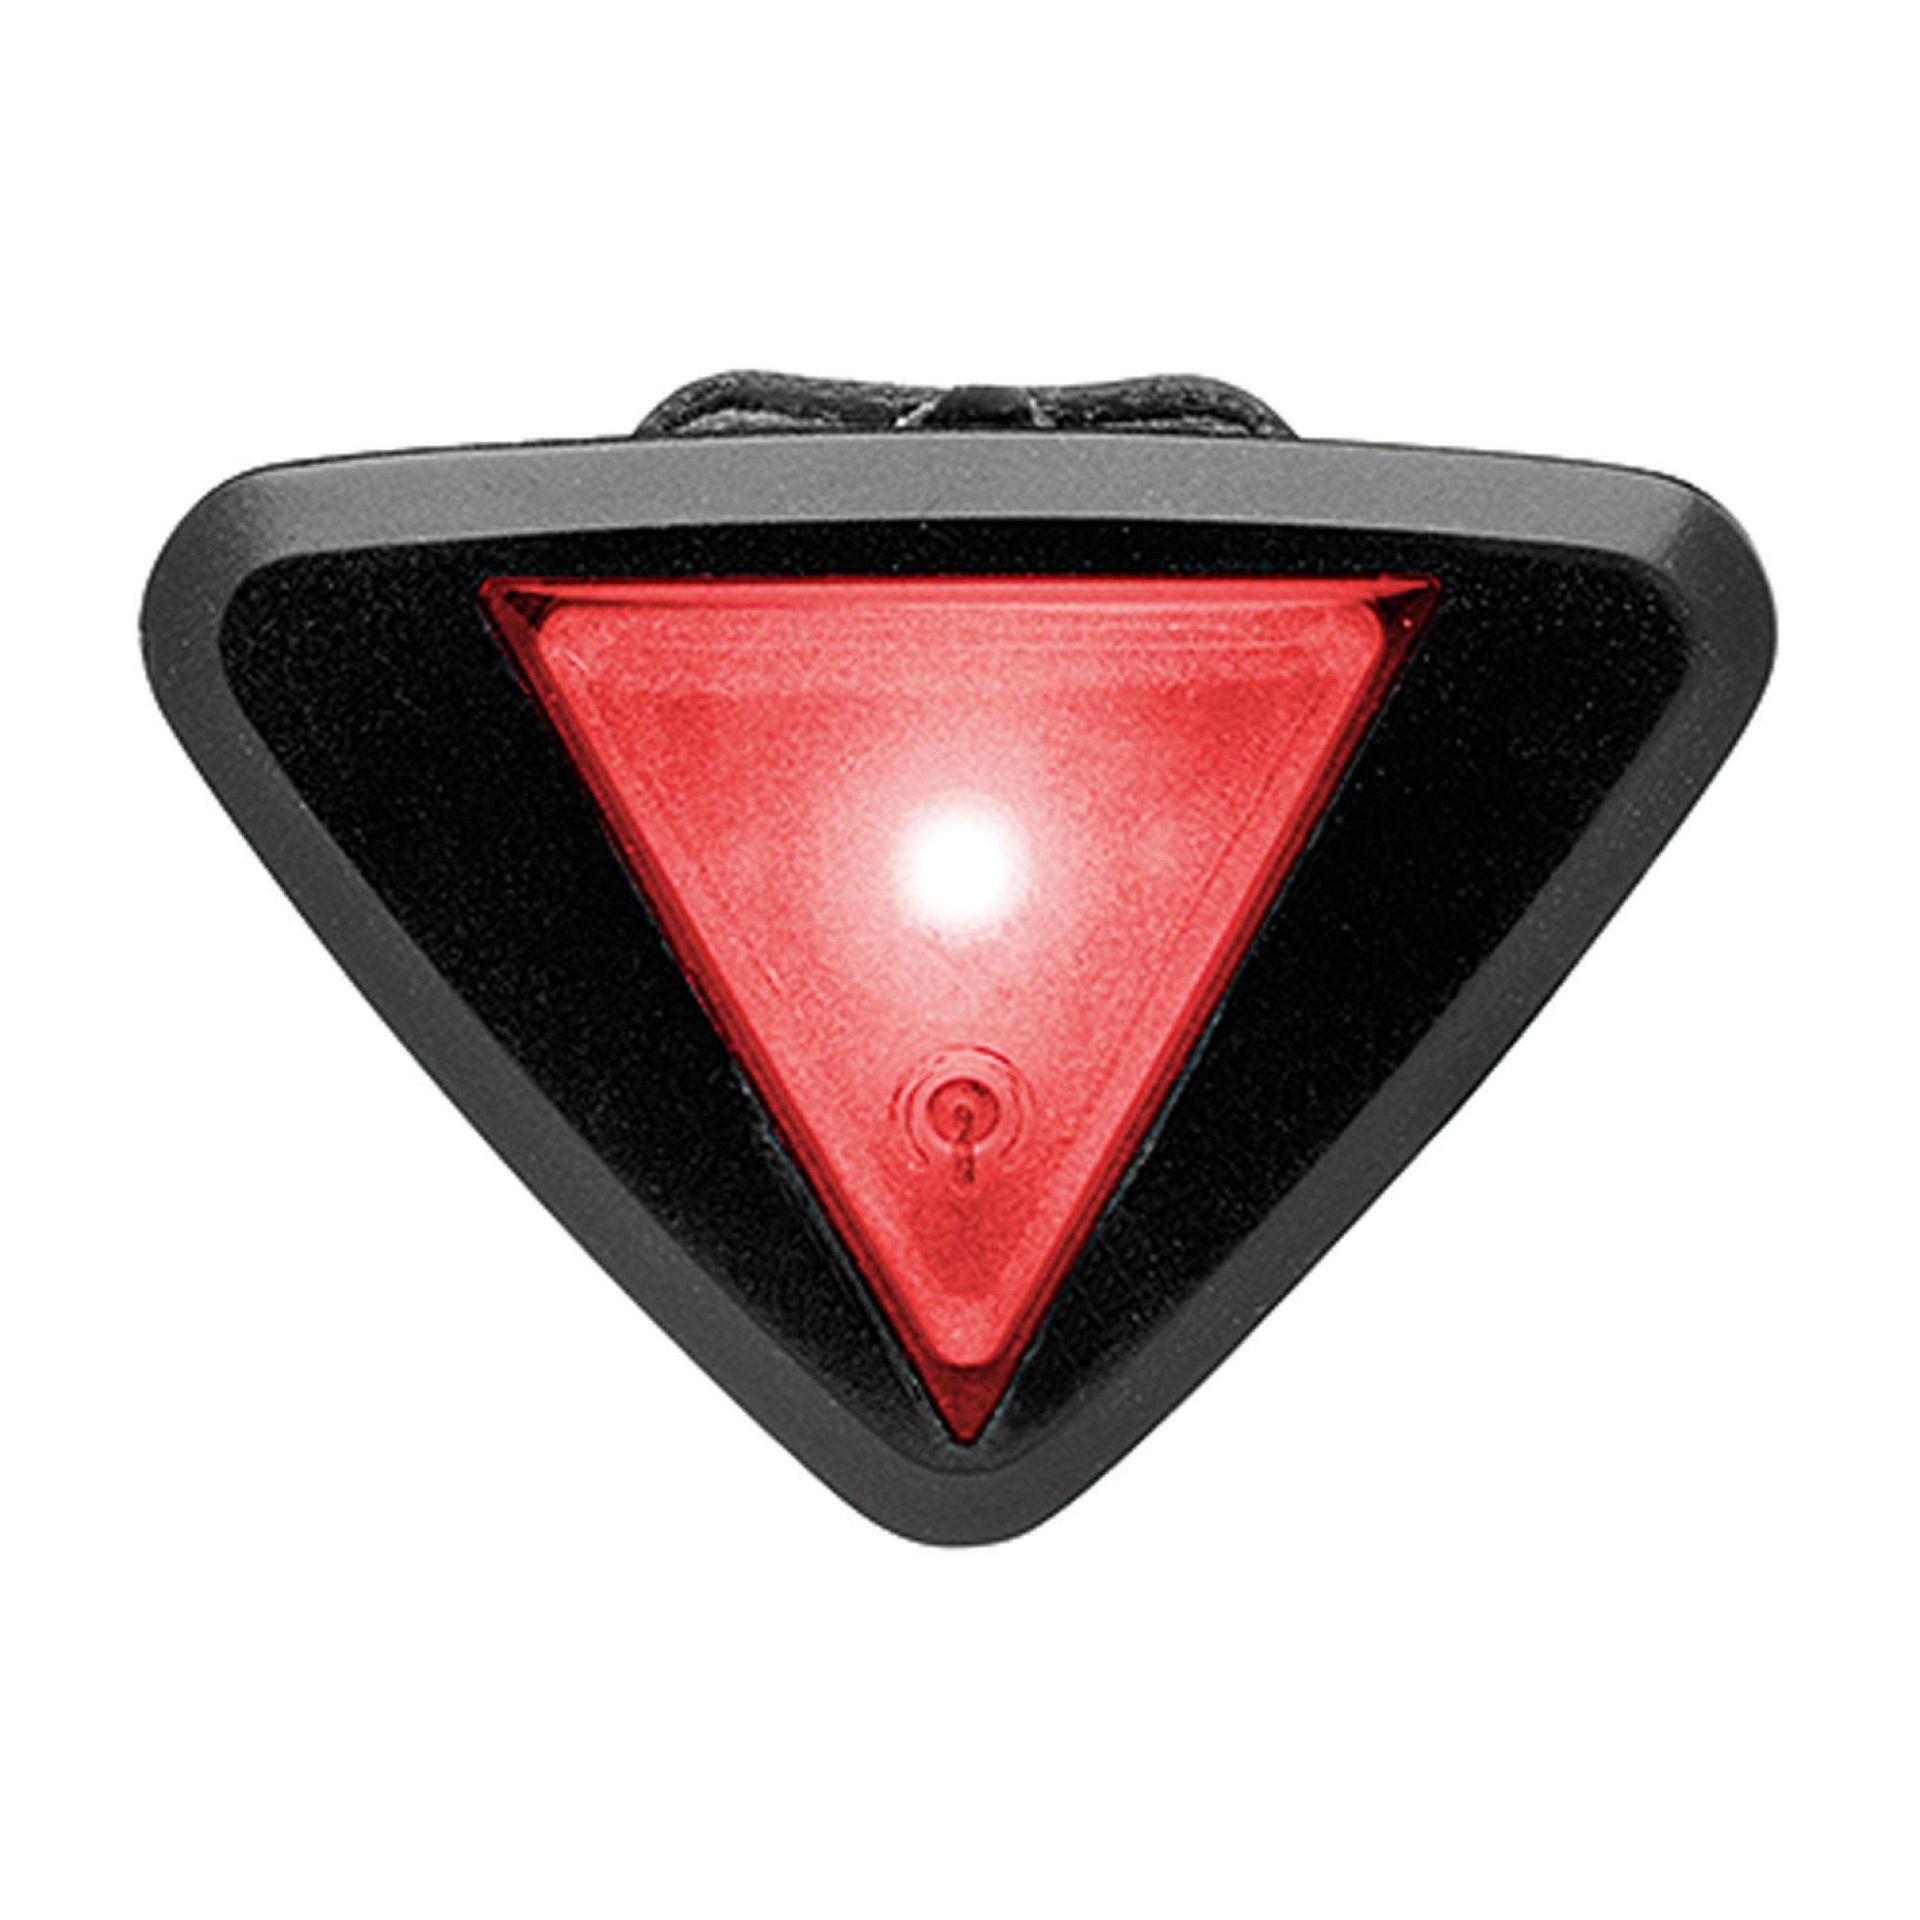 LAMPKA NA KASK  UVEX PLUG-IN LED XB044